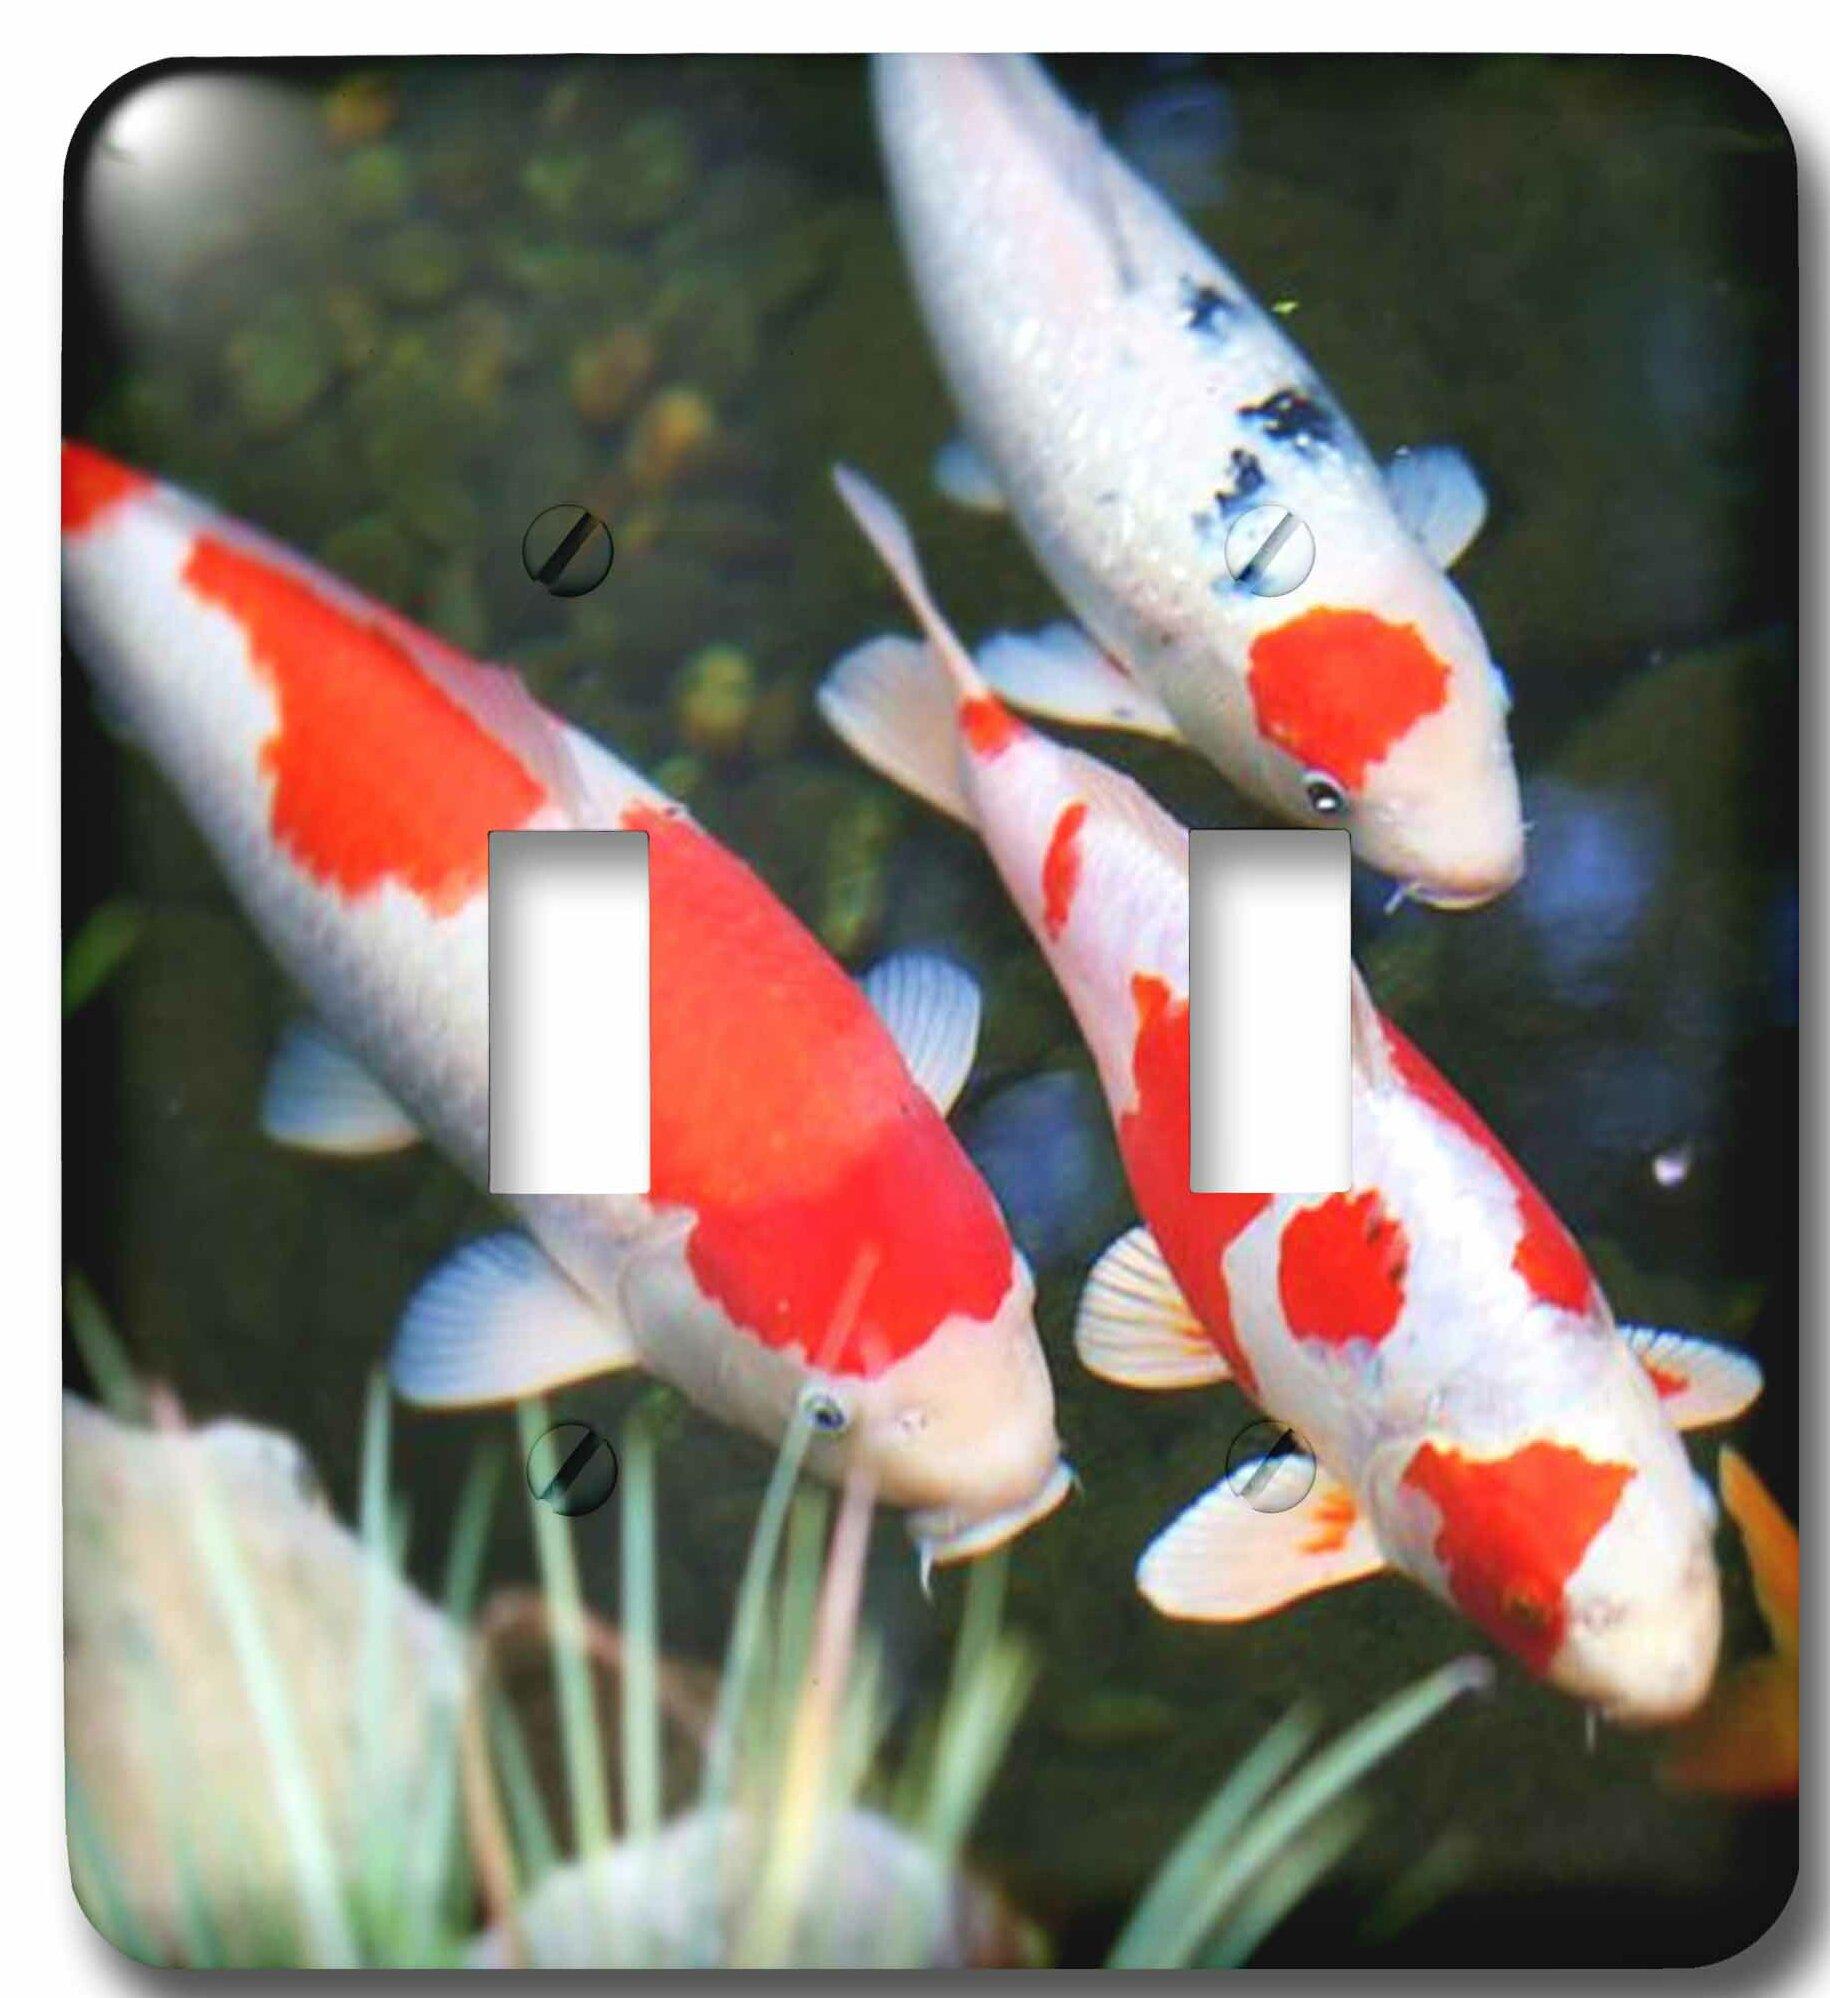 3drose Japanese Koi Fish 2 Gang Toggle Light Switch Wall Plate Wayfair